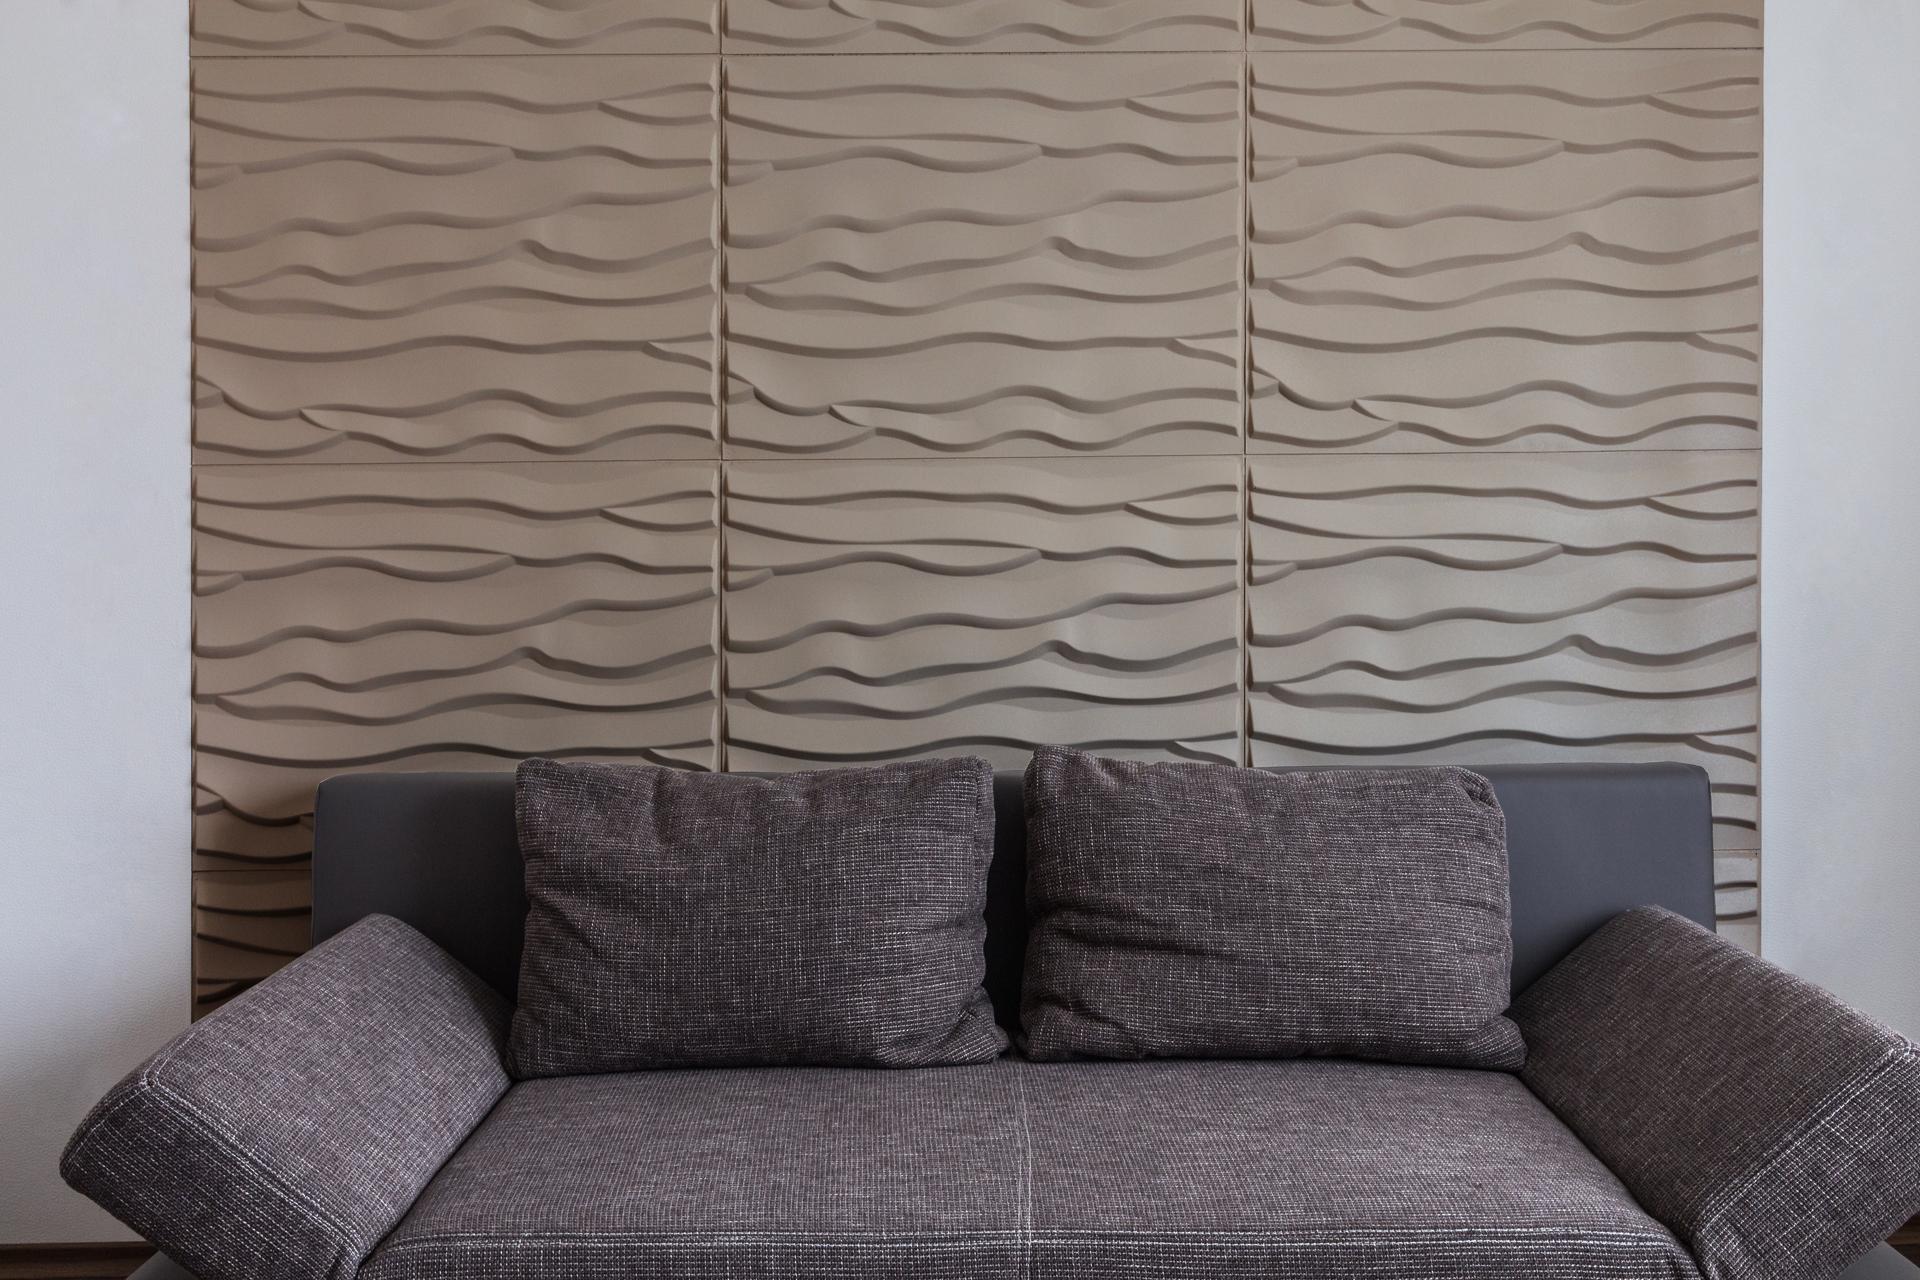 3D Wandpaneele - Referenzen - W. Müller - Beach - Deckenpaneele - 3D Tapeten - Wandverkleidung - Verblender